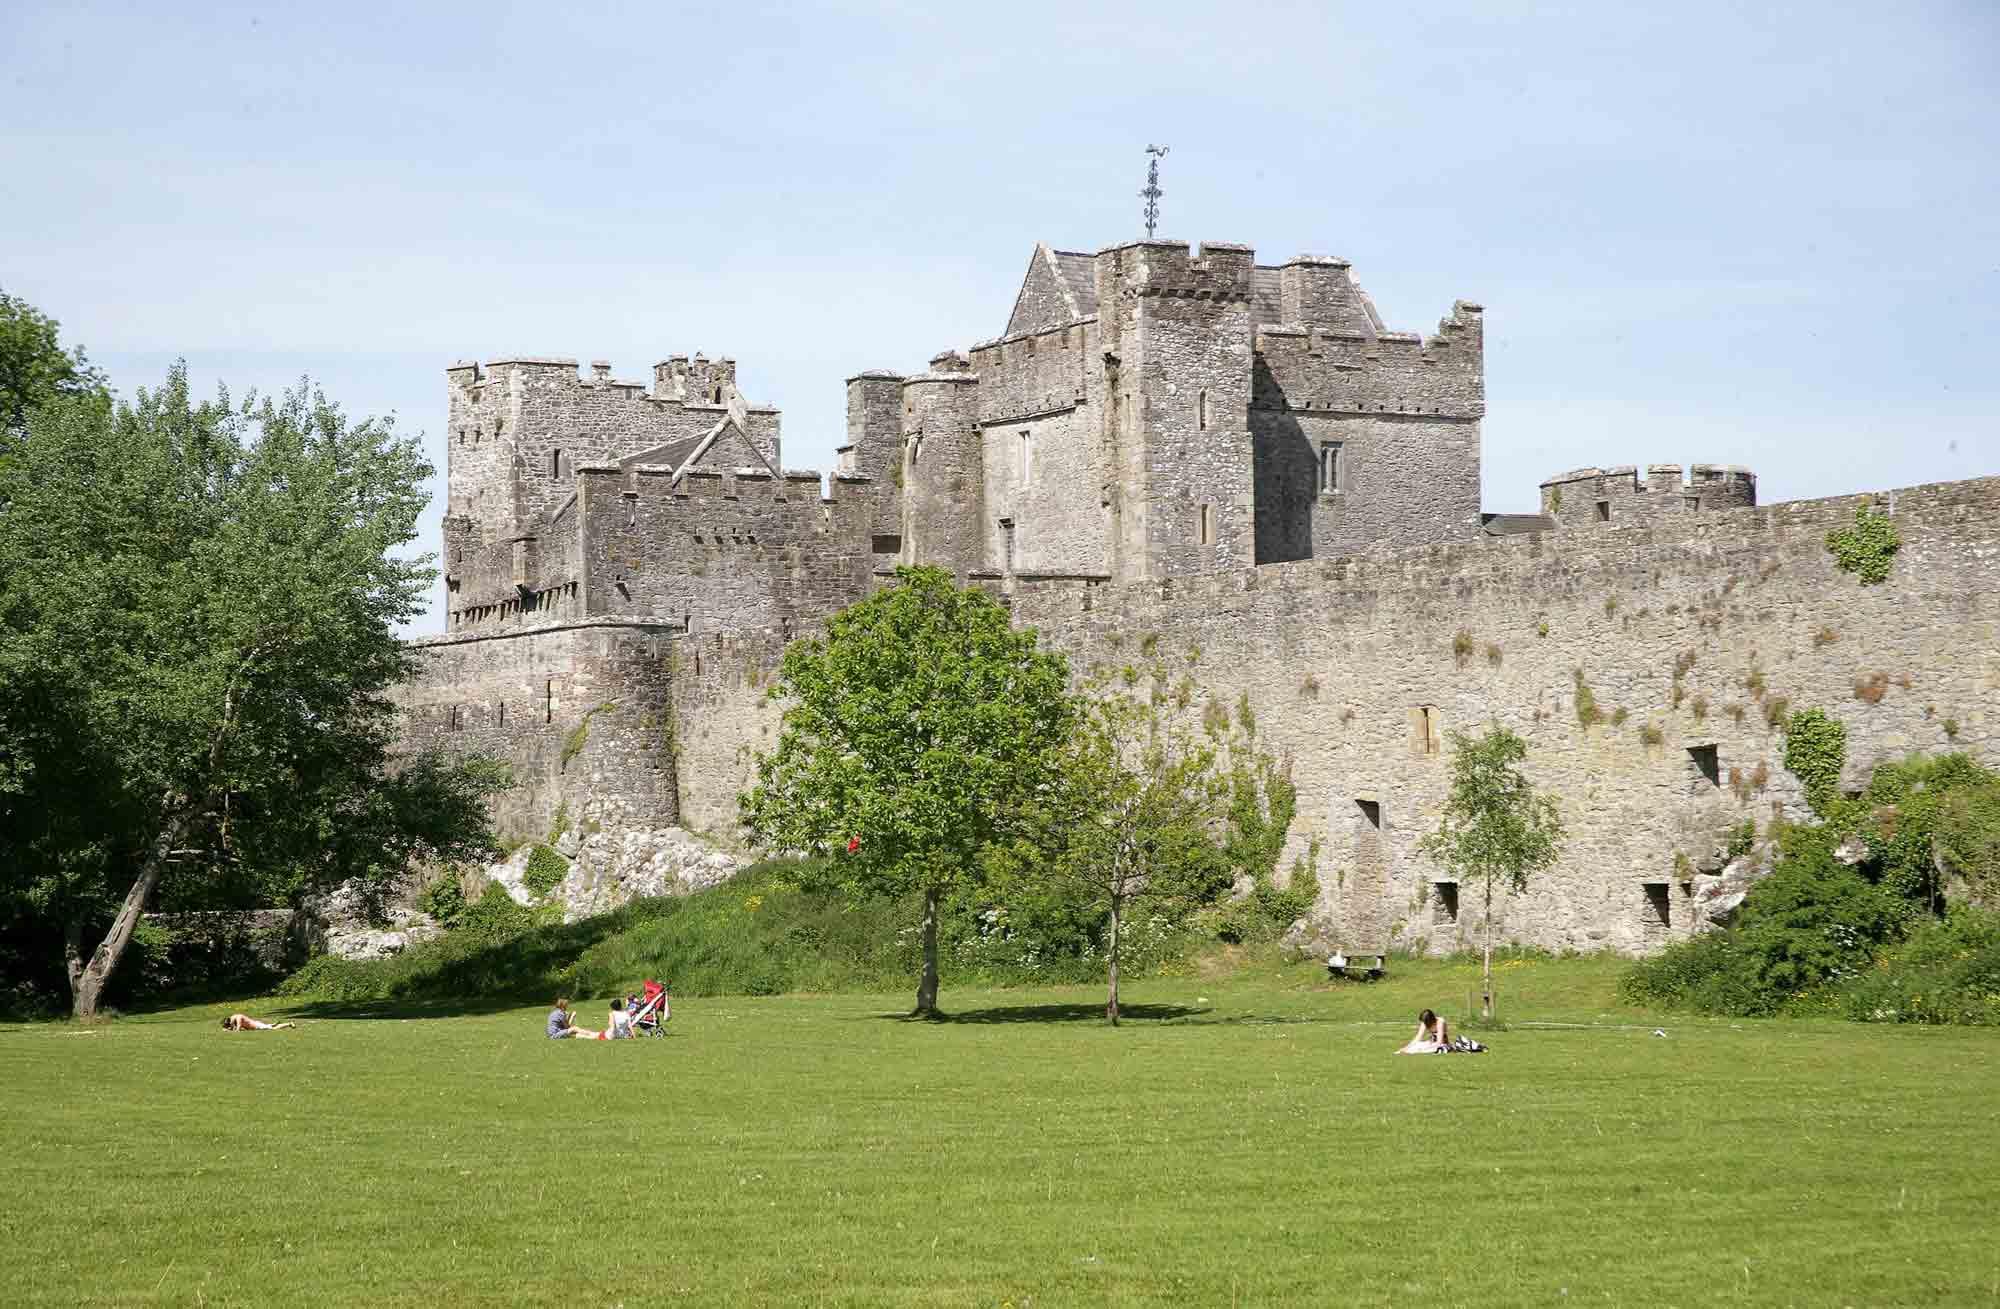 en area behind the castle.